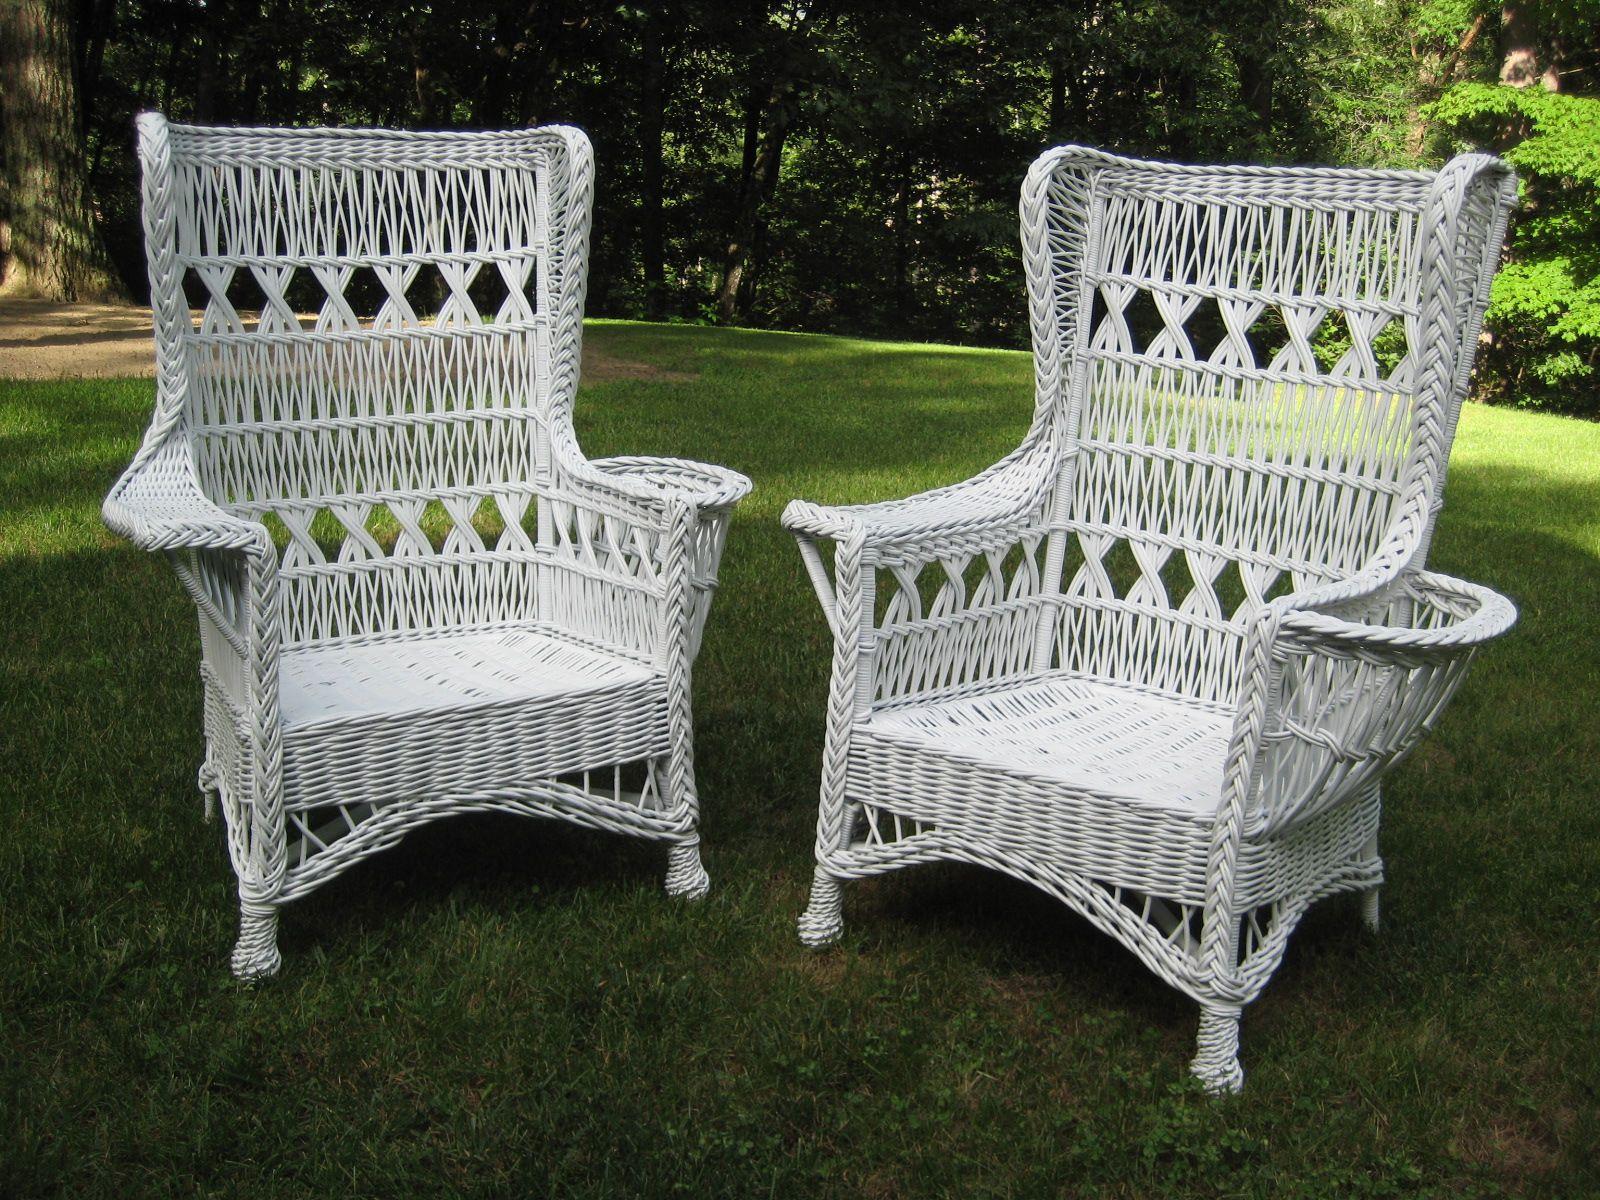 Genial Http://interior.mintleafberkeley.com/wp Content/uploads/2015/06/vintage  Wicker And Rattan Furniture